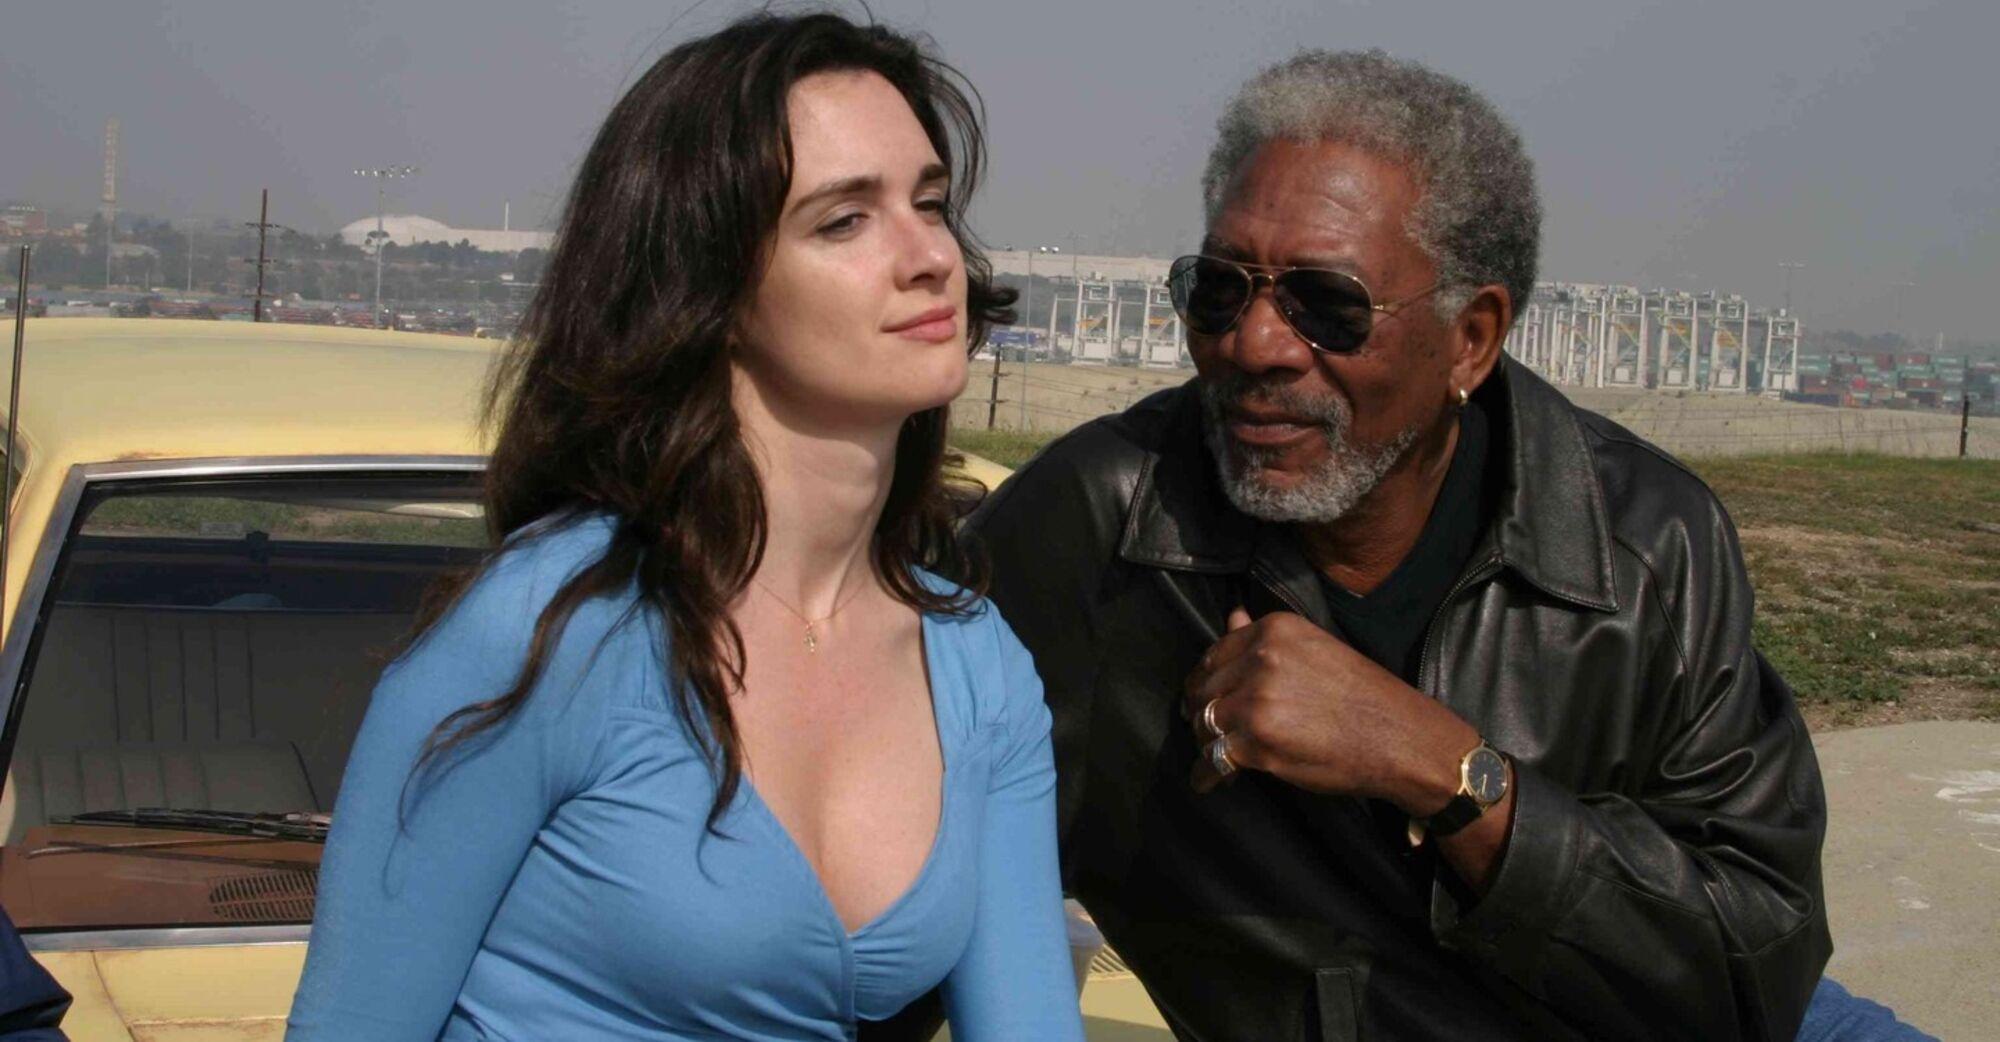 10 items or less (2006): Paz Vega & Morgan Freeman